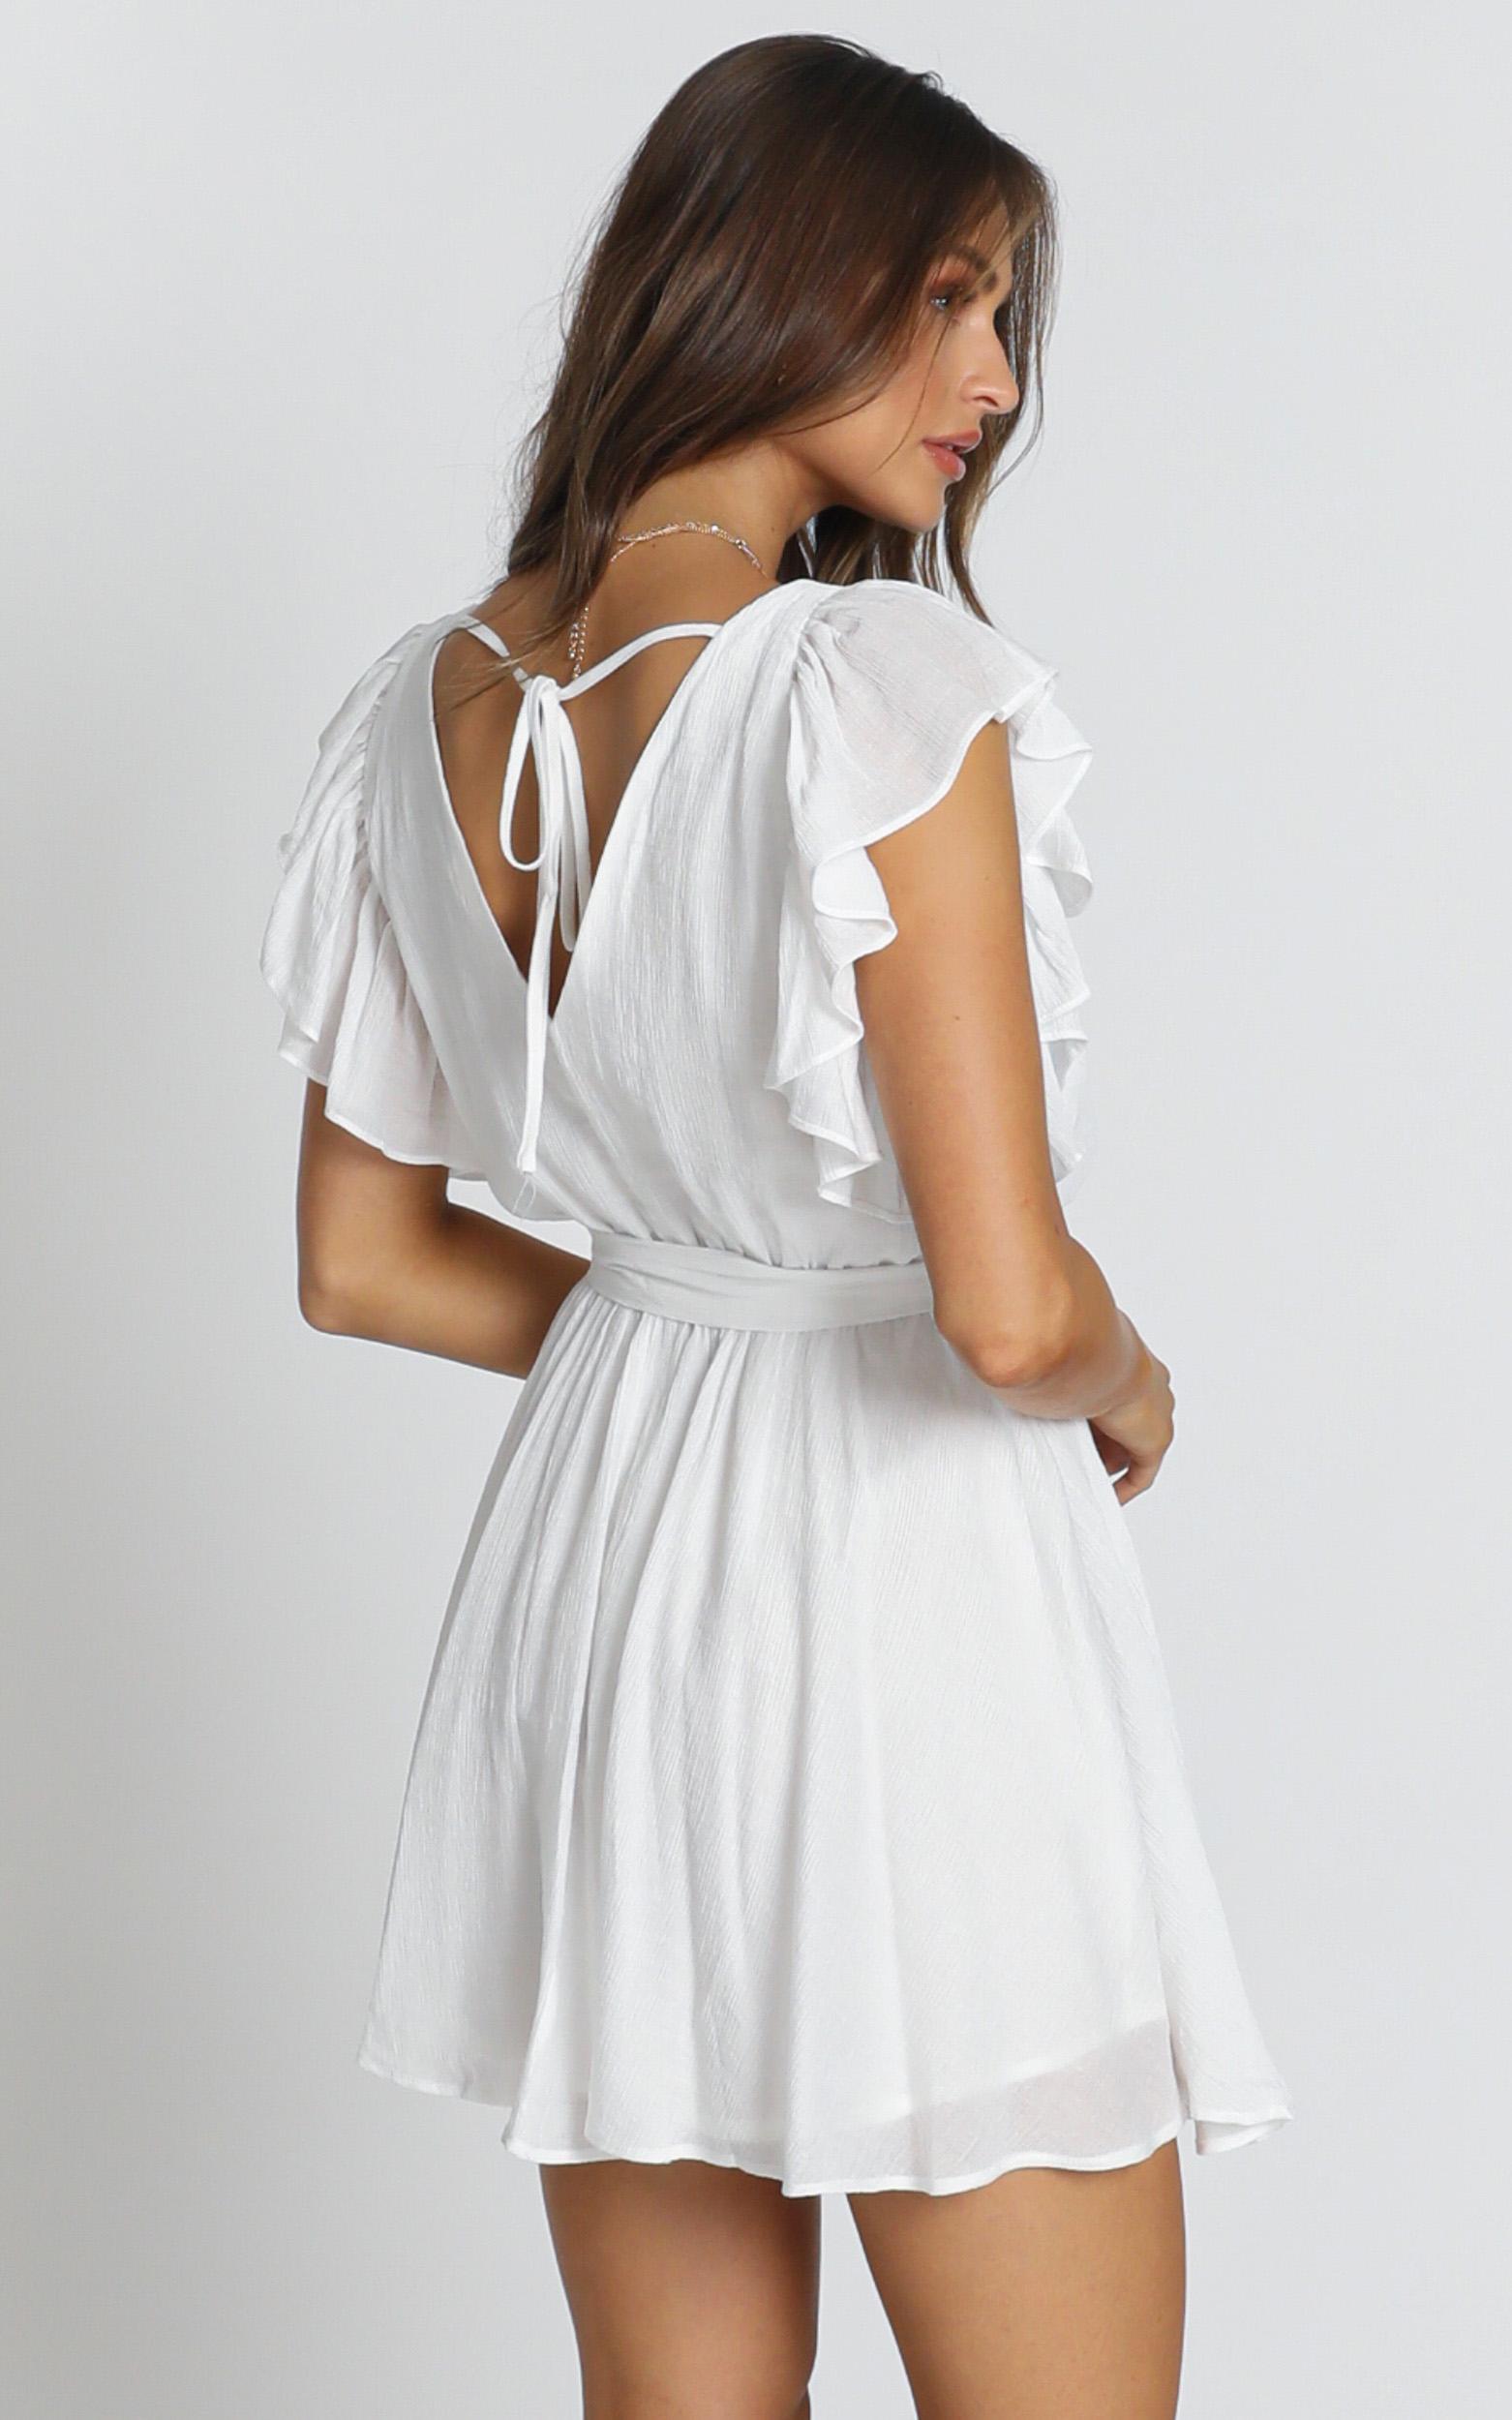 Rosalie Dress in white - 12 (L), White, hi-res image number null